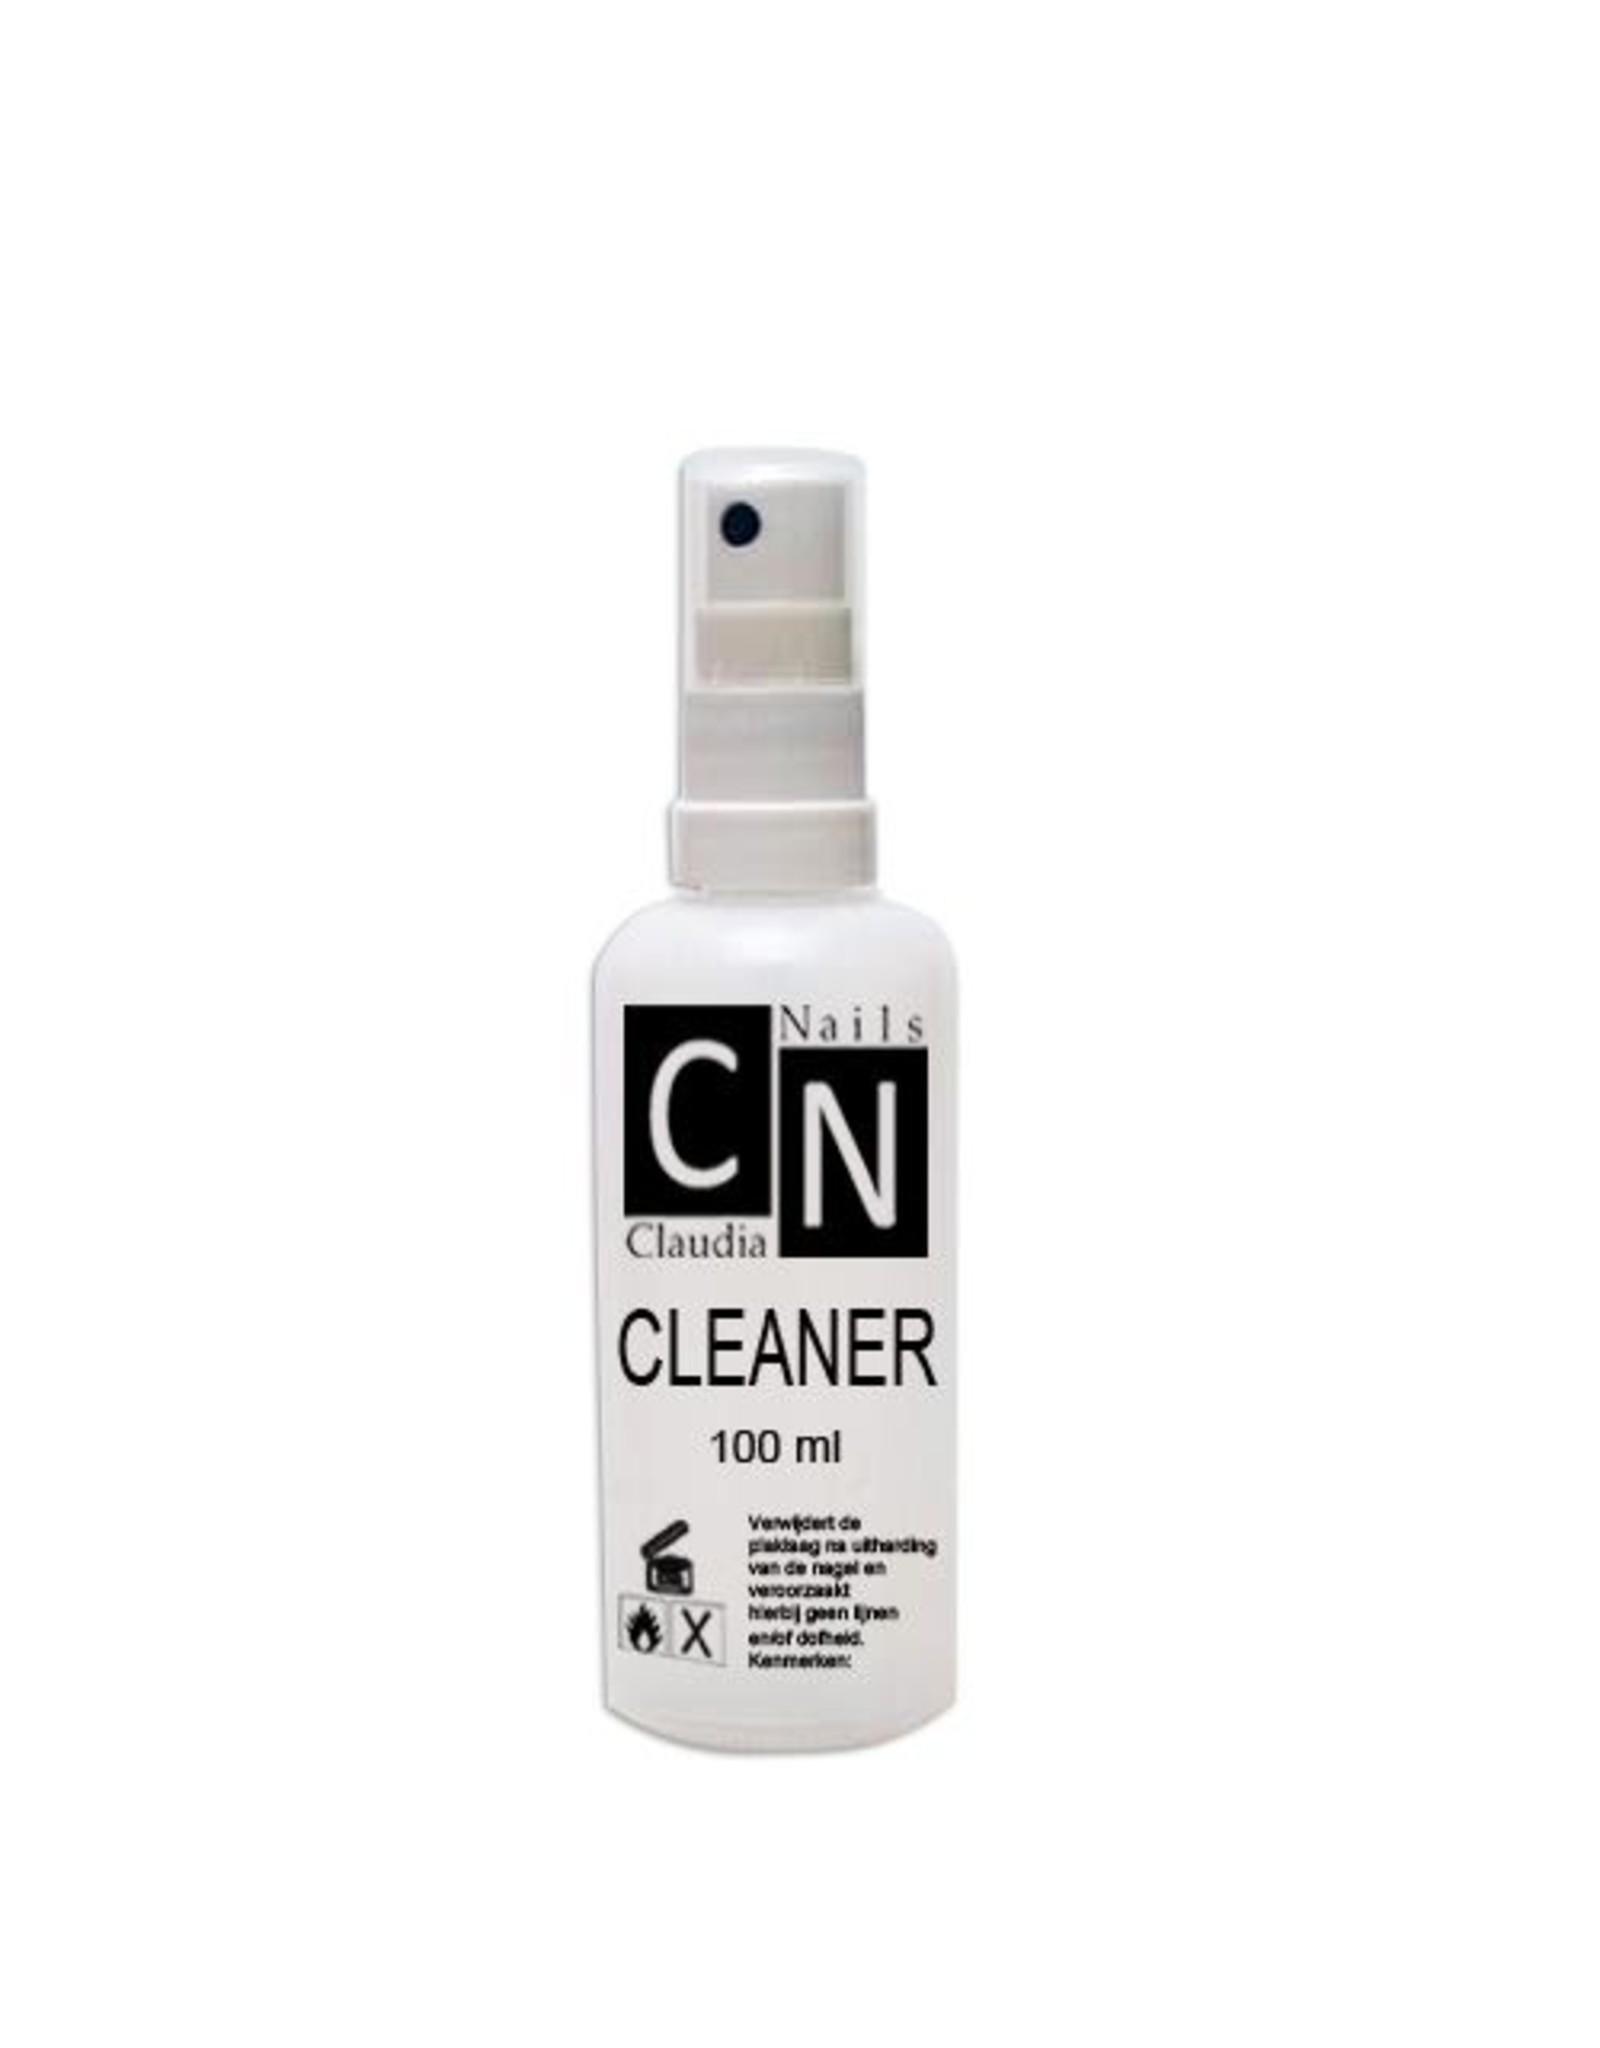 ClaudiaNails Cleaner met spray 100 ml